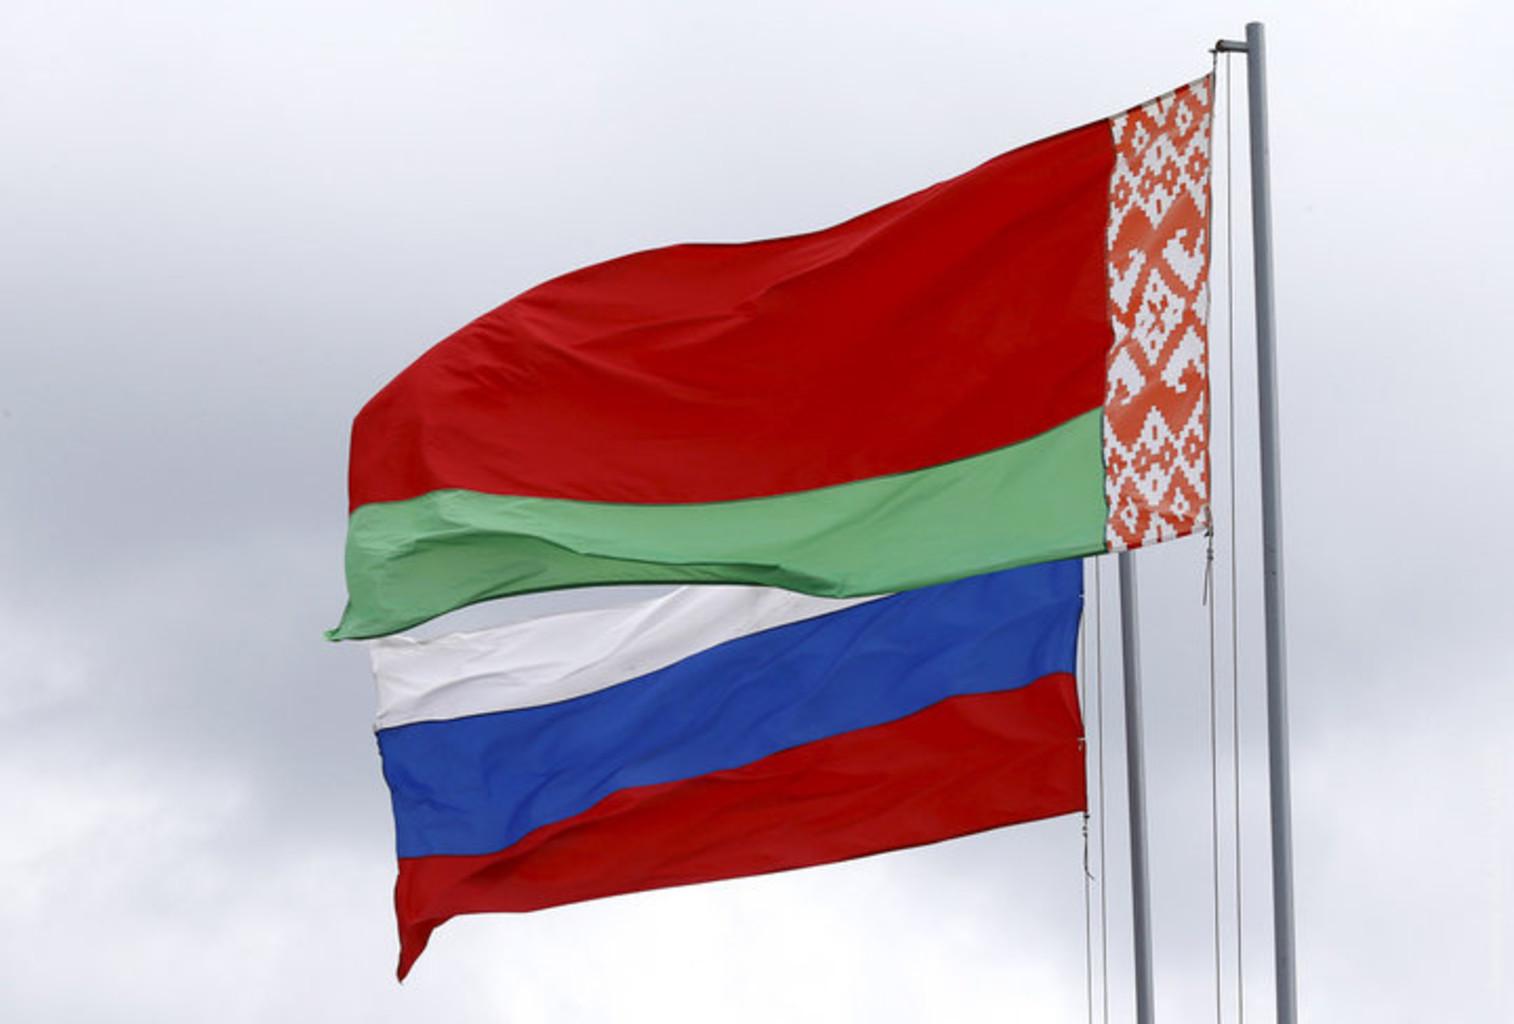 Belarus rossiya flag reuters rtx2aoj9